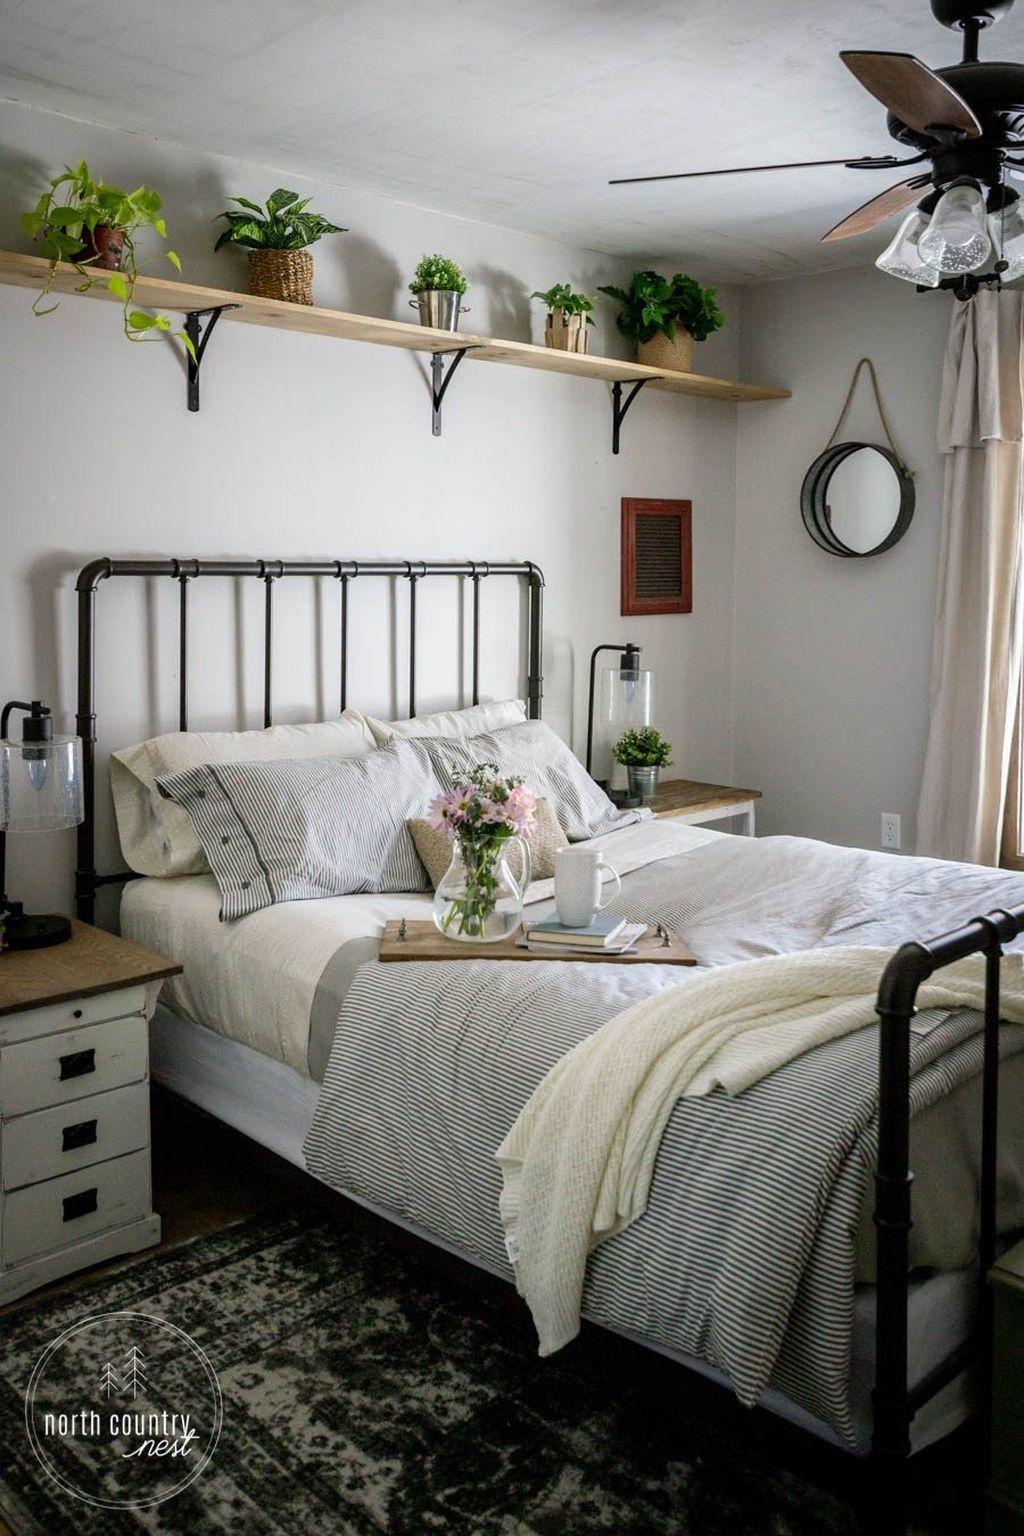 Lovely Spring Bedroom Decor Ideas Trending This Year 25